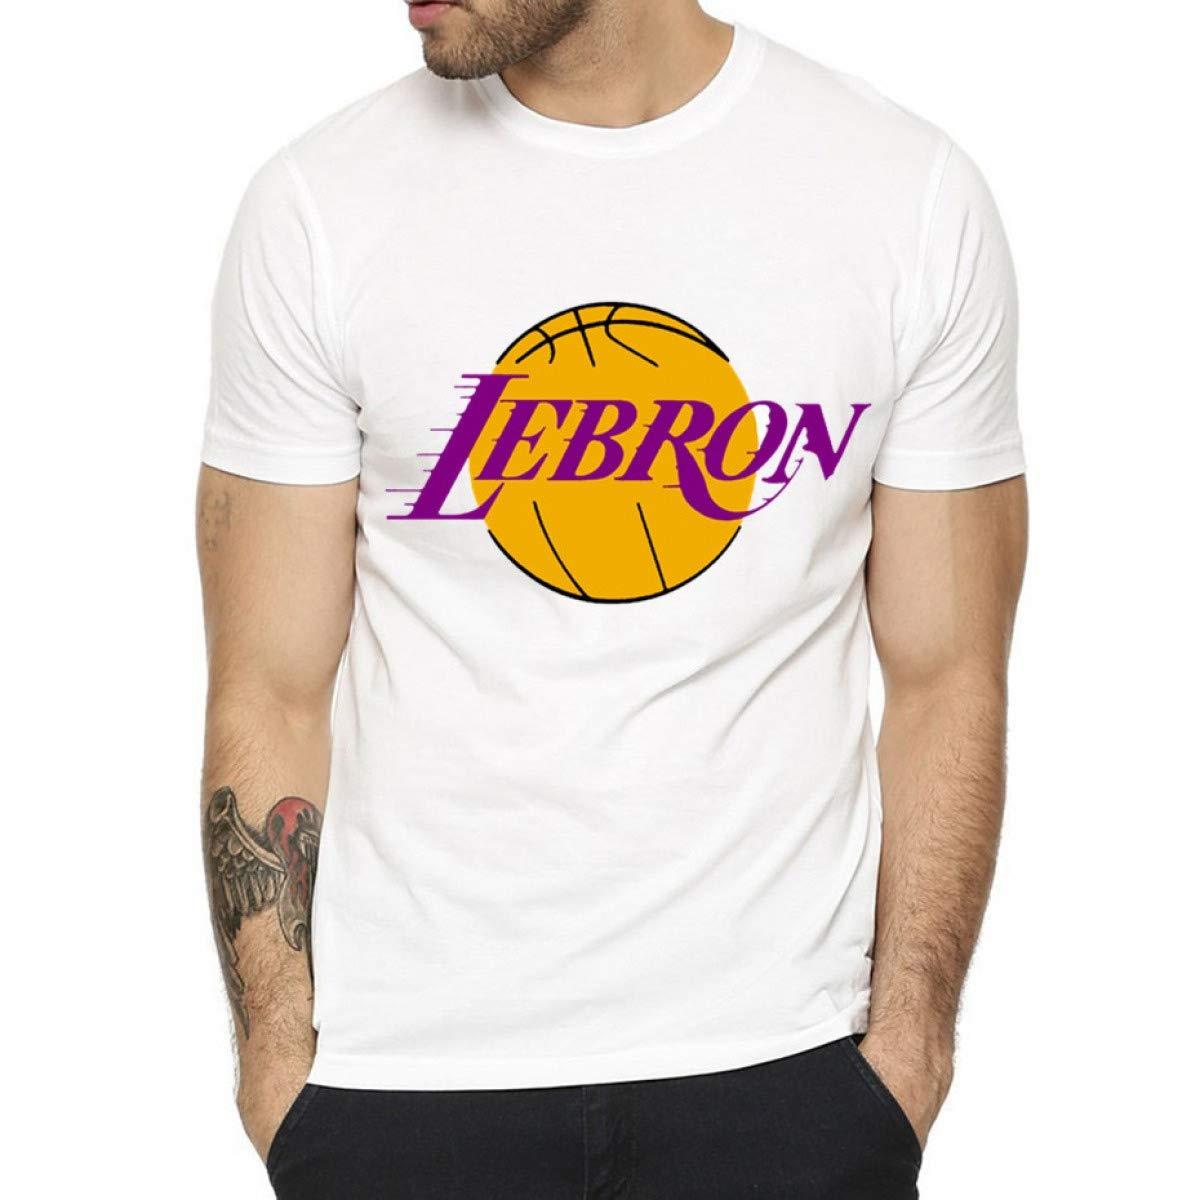 High quality Lebron LA Print T-Shirts Los Angeles James Tee Fitness Top Tshirt Mens Lakers Jersey Black Shorts Lakers Shot Put Shoes